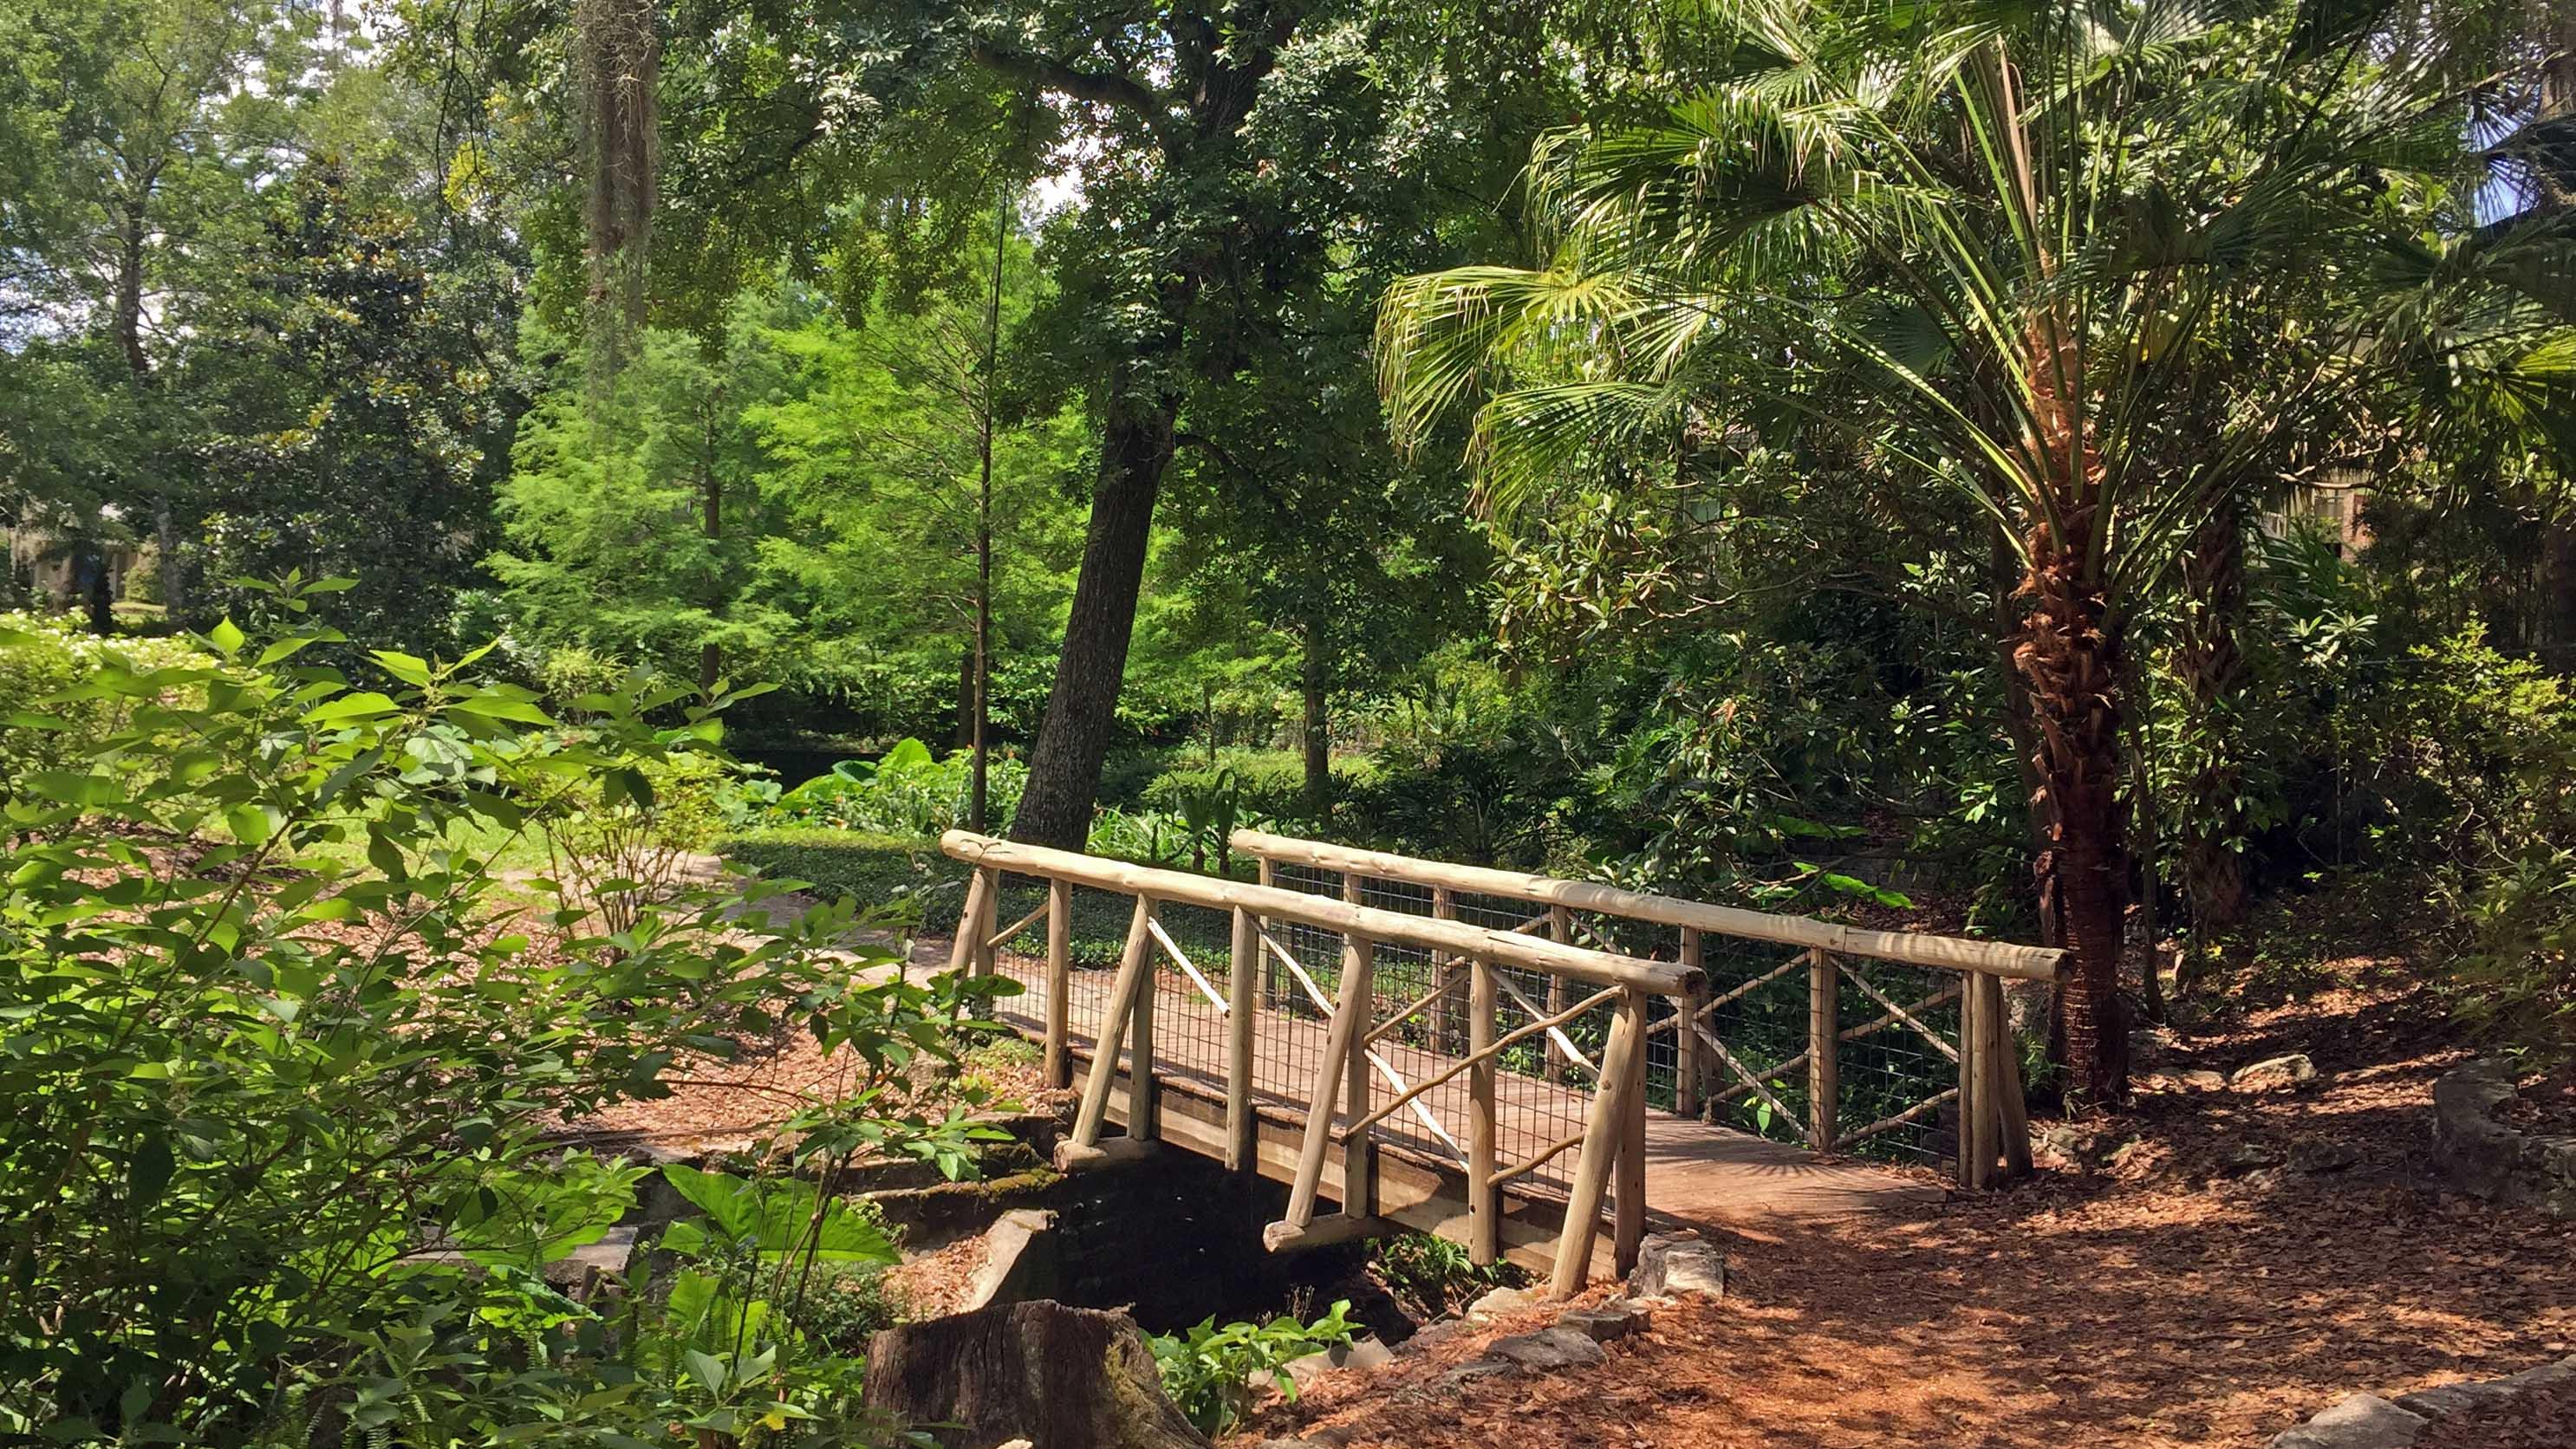 Dickson Azelea Park